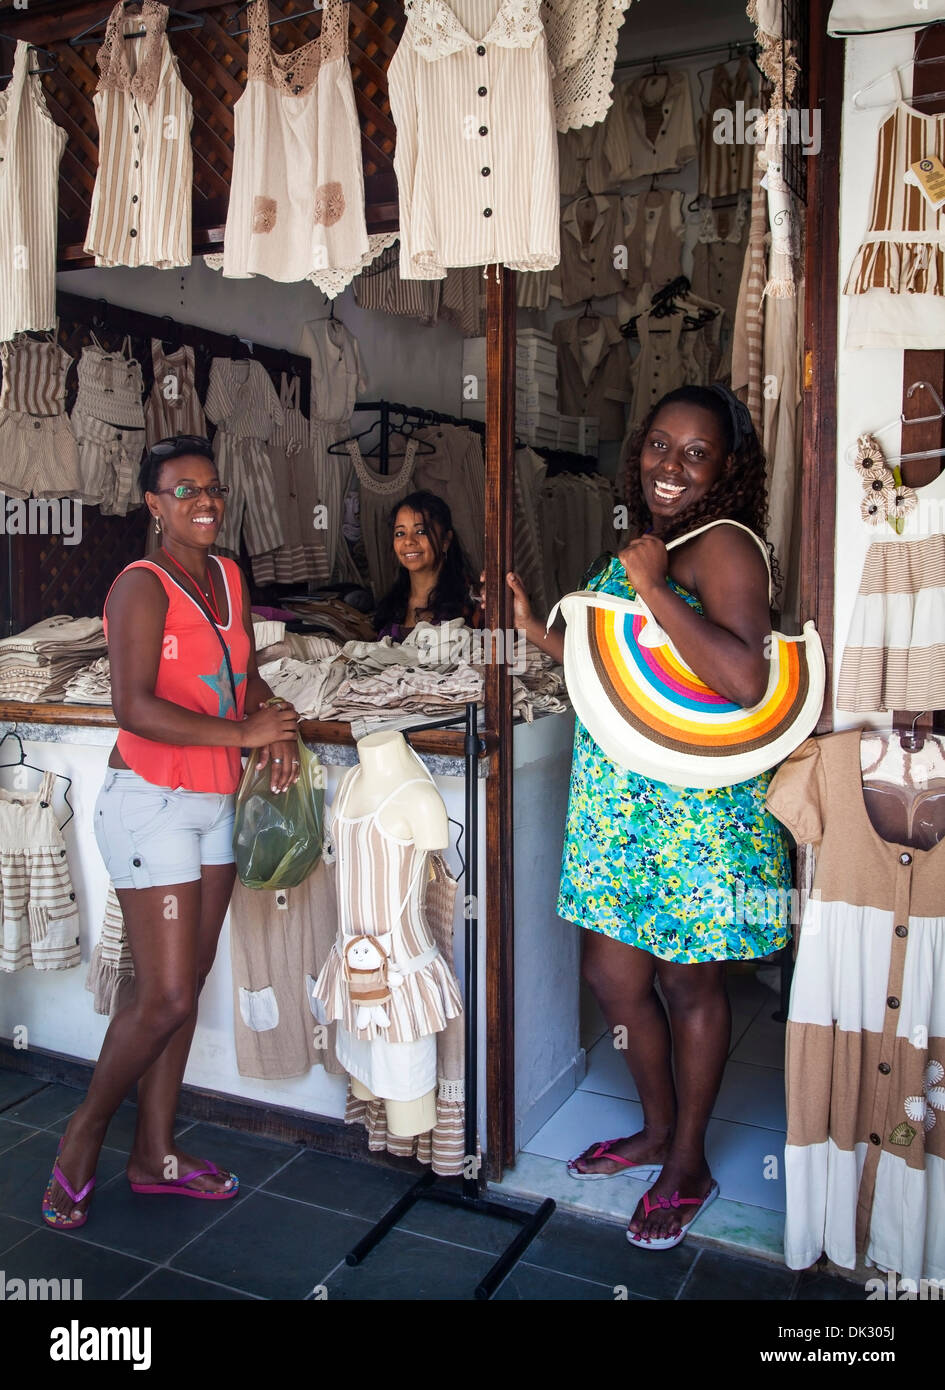 Le donne lo shopping al Centro de Turismo do Ceará, Fortaleza, Brasile. Immagini Stock